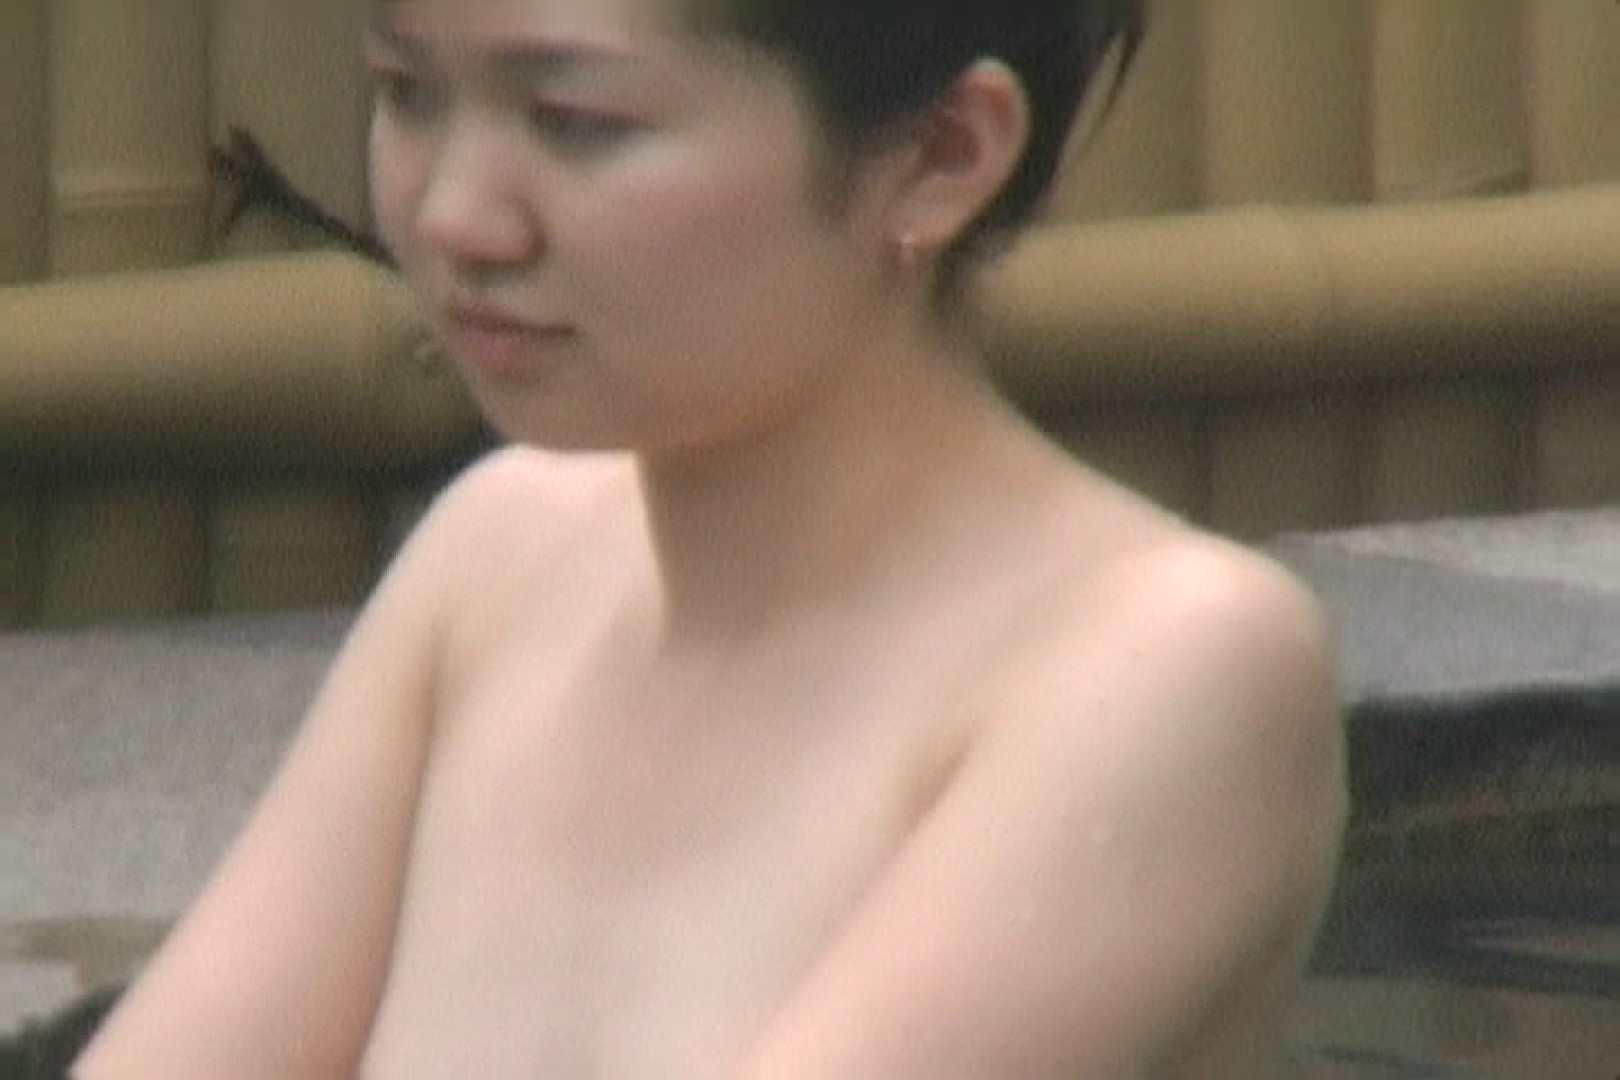 Aquaな露天風呂Vol.641 盗撮師作品  97pic 39